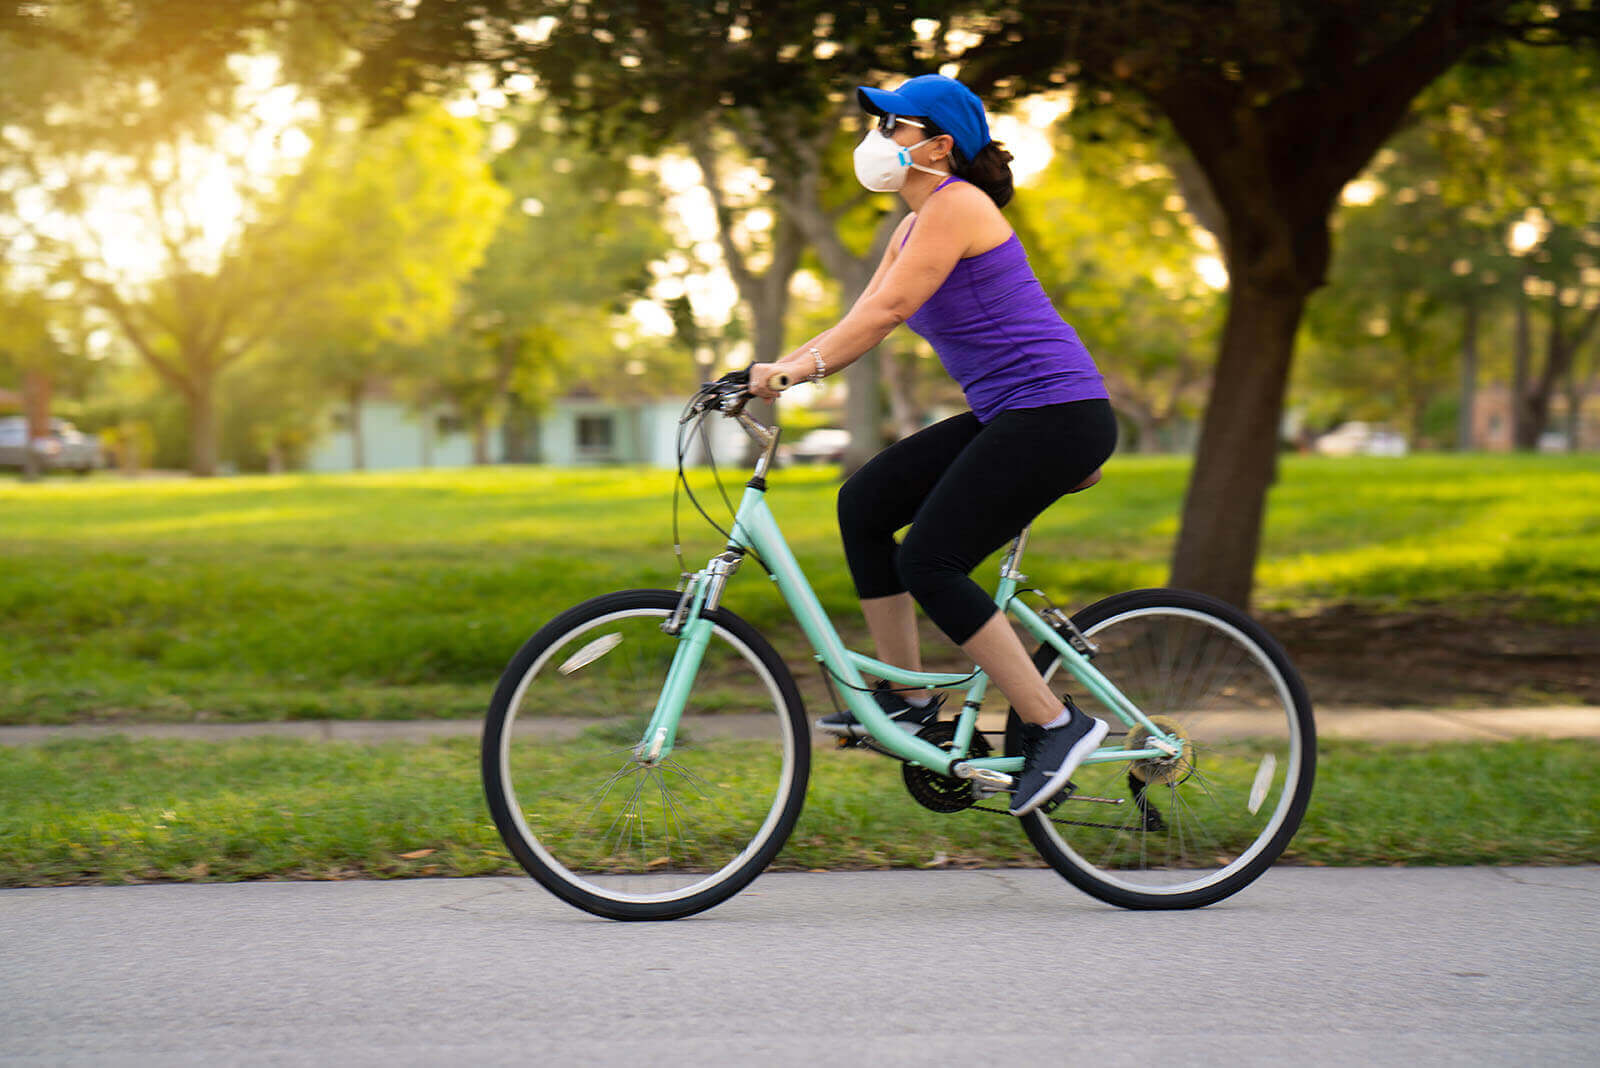 vida-saludable-deportes